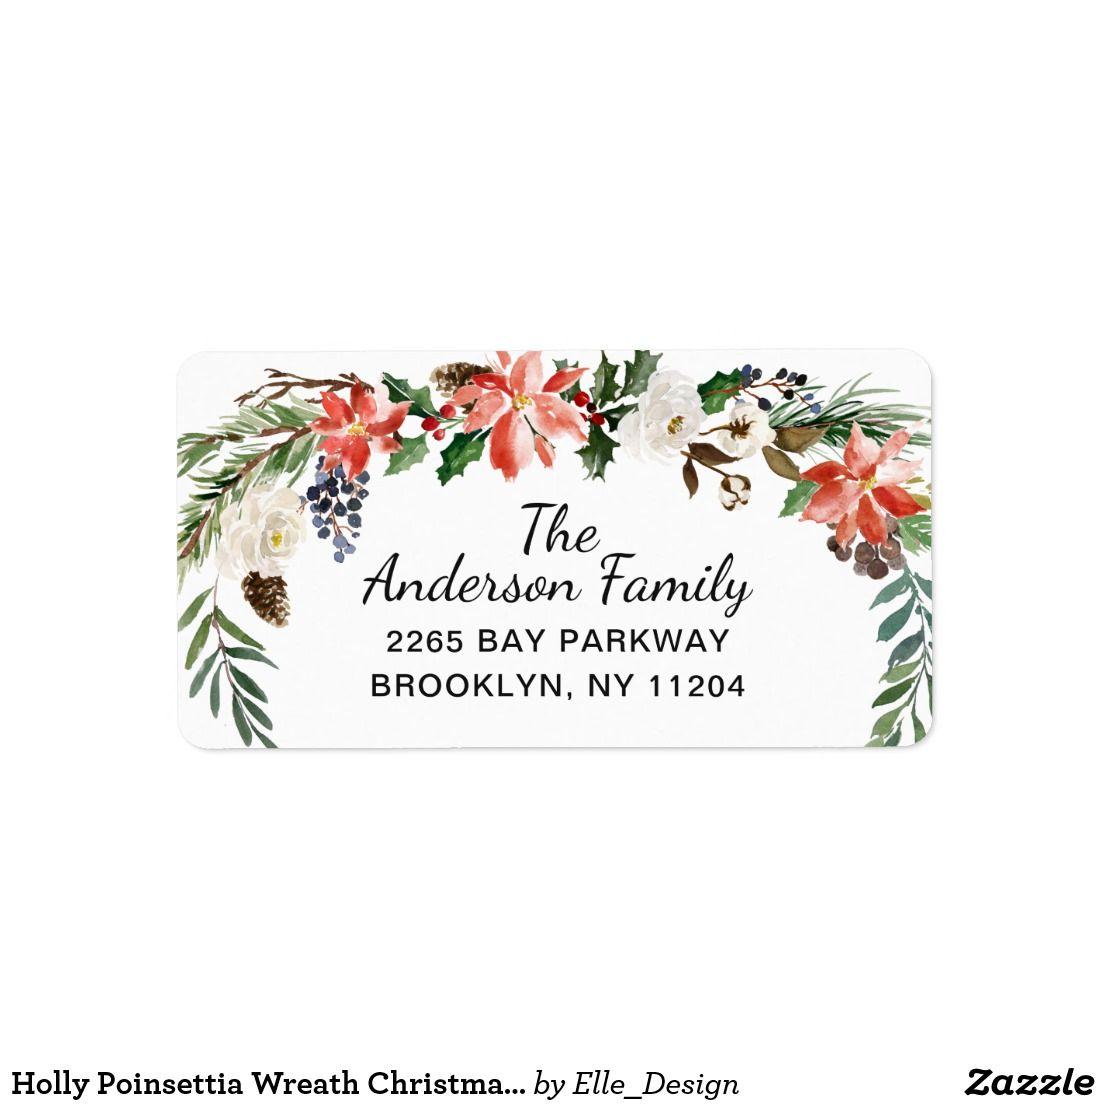 Holly Poinsettia Wreath Christmas Return Address Label